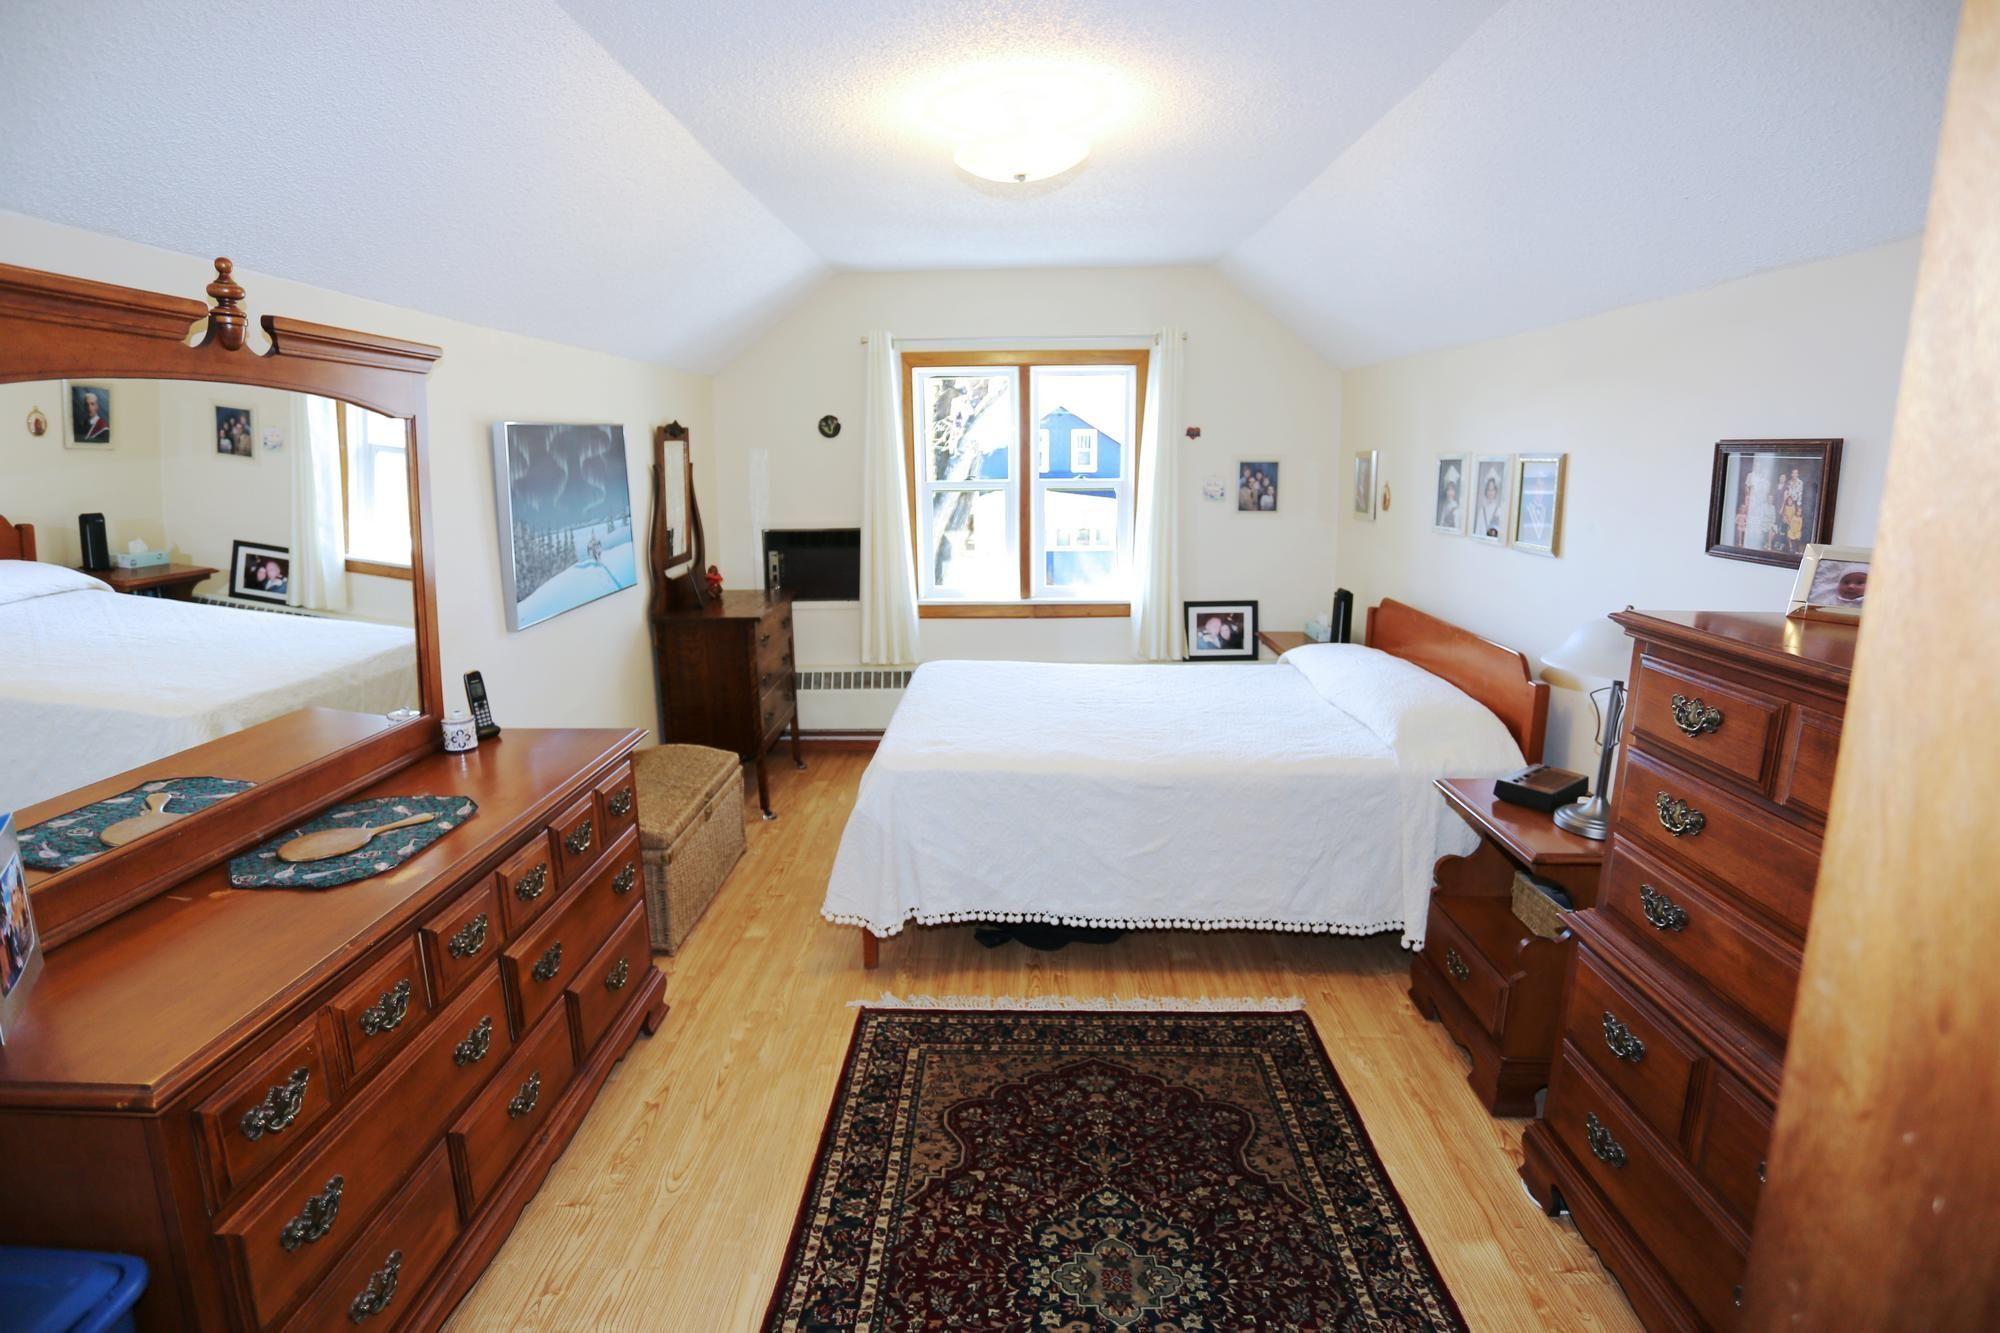 Photo 21: Photos: 109 Garfield Street South in Winnipeg: Wolseley Single Family Detached for sale (5B)  : MLS®# 1808340